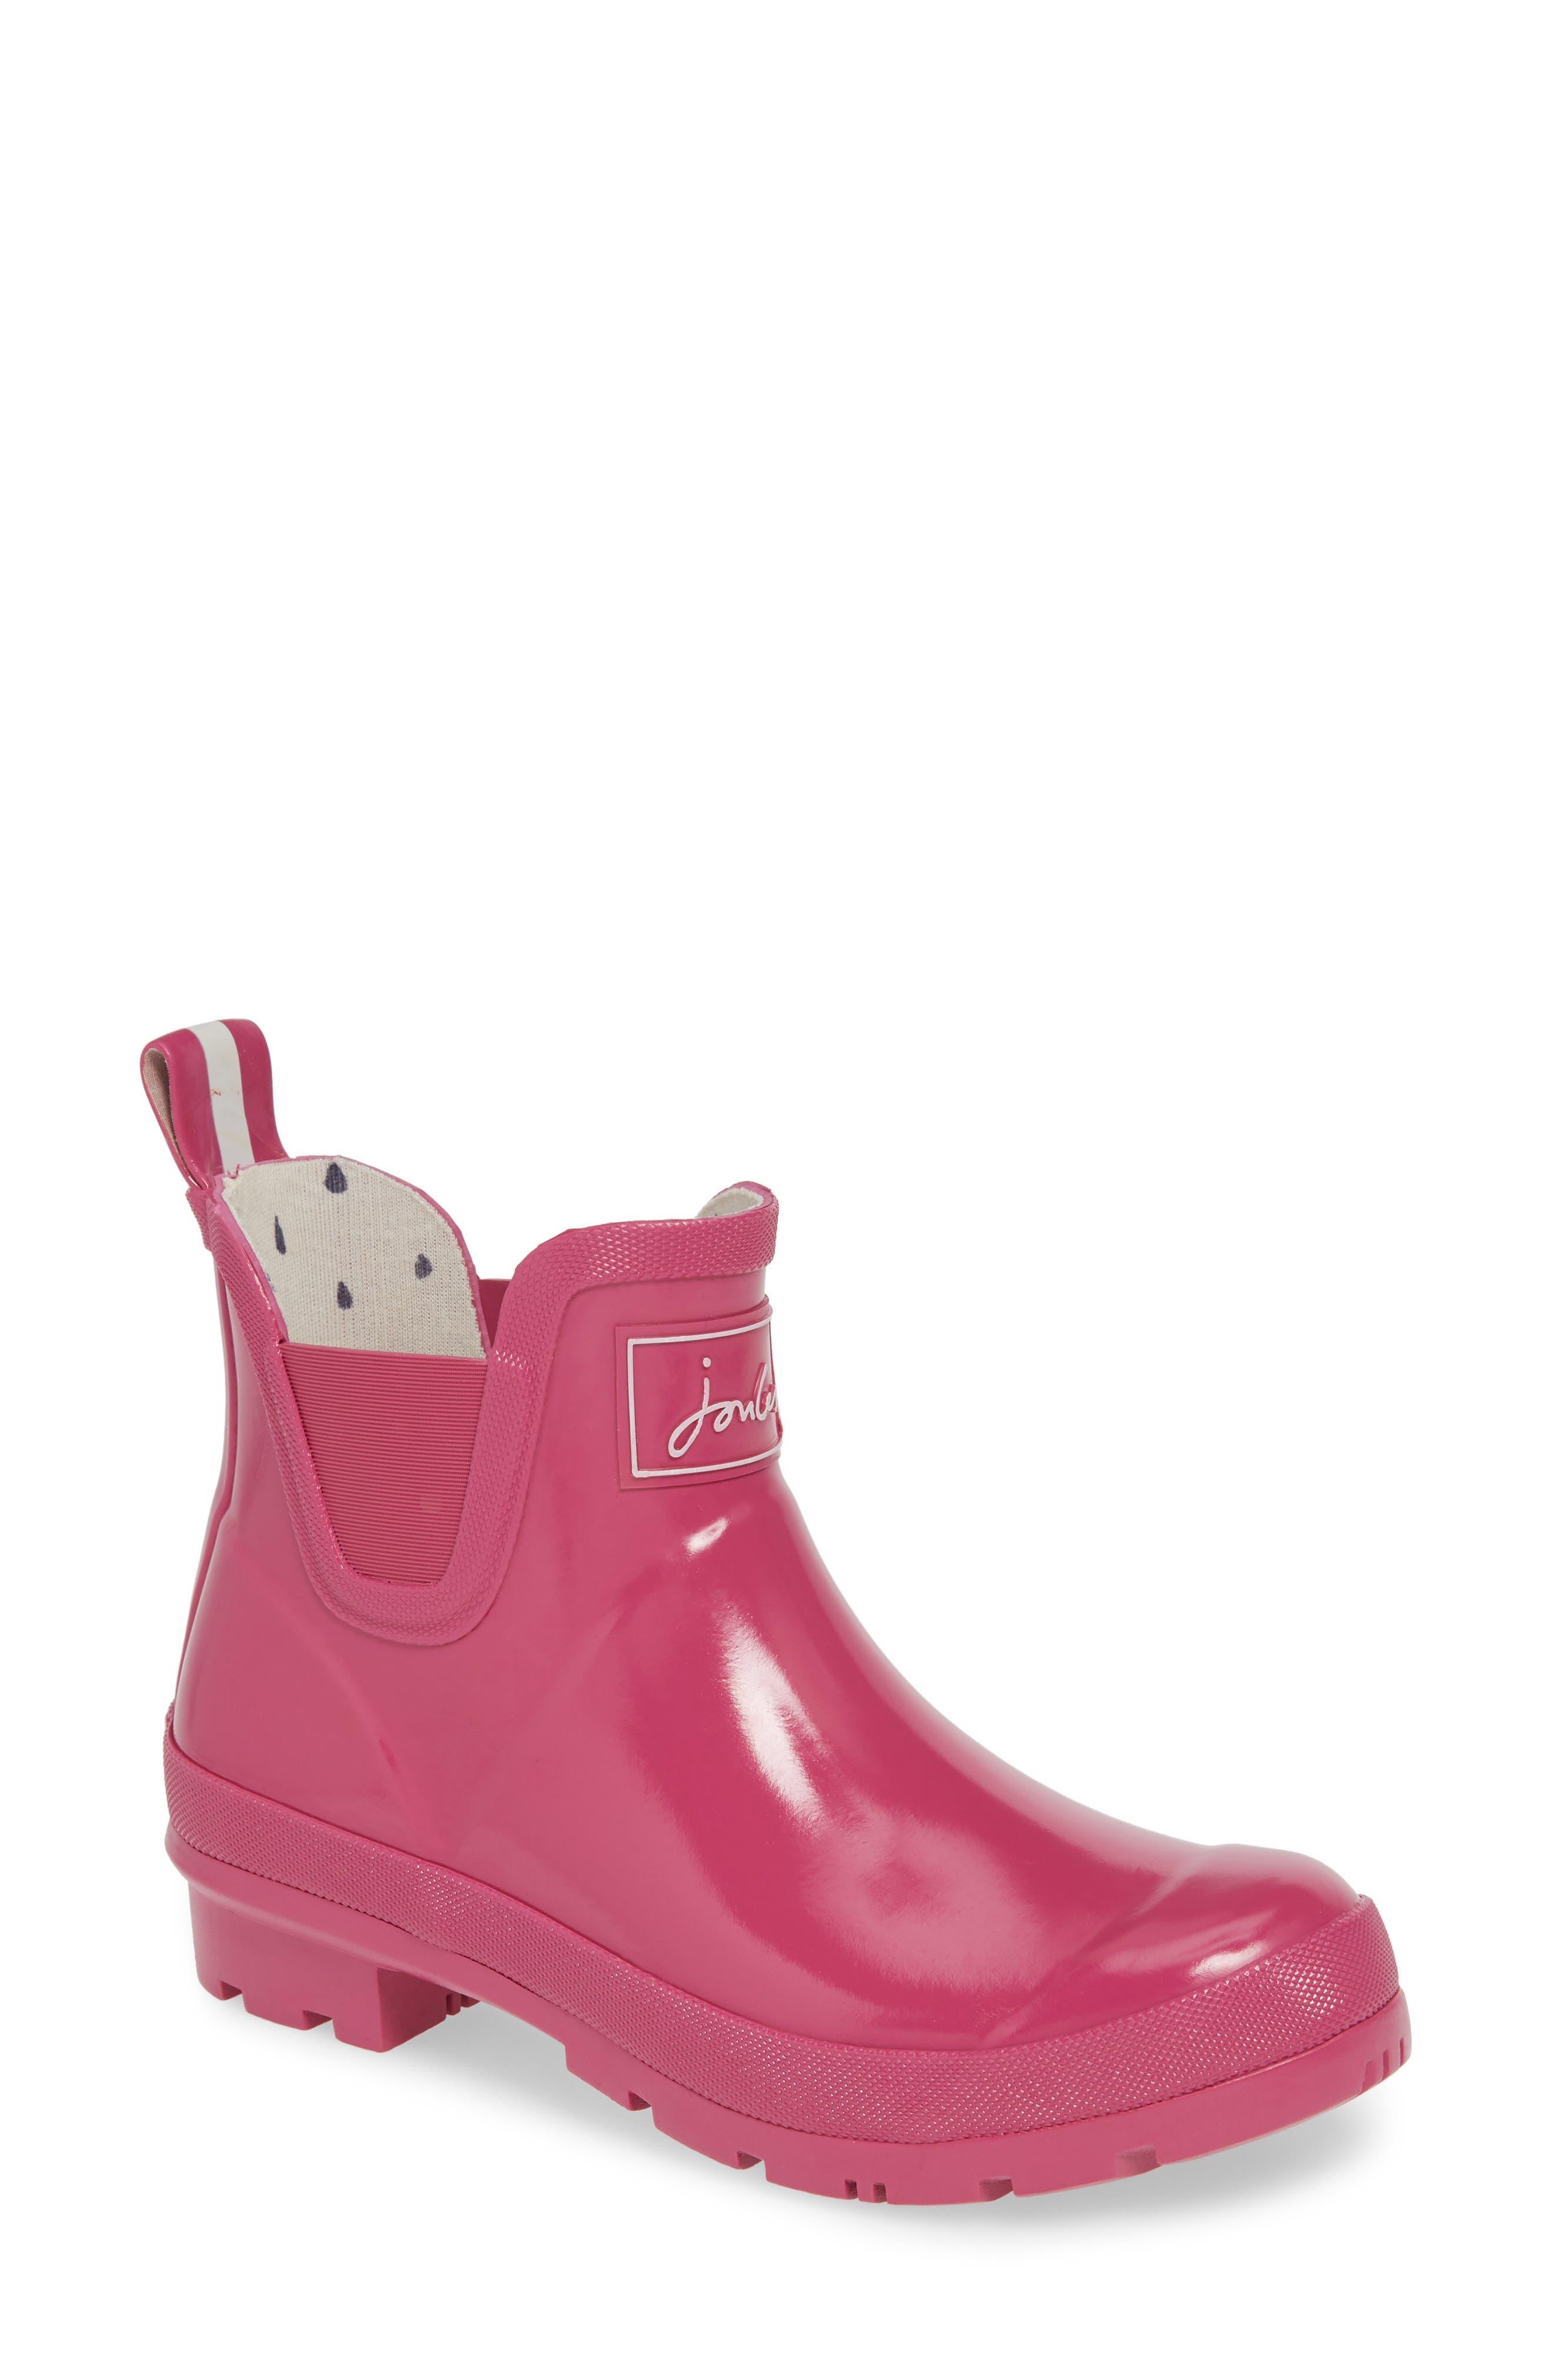 JOULES Wellibob Short Rain Boot, Main, color, PINK/ PINK